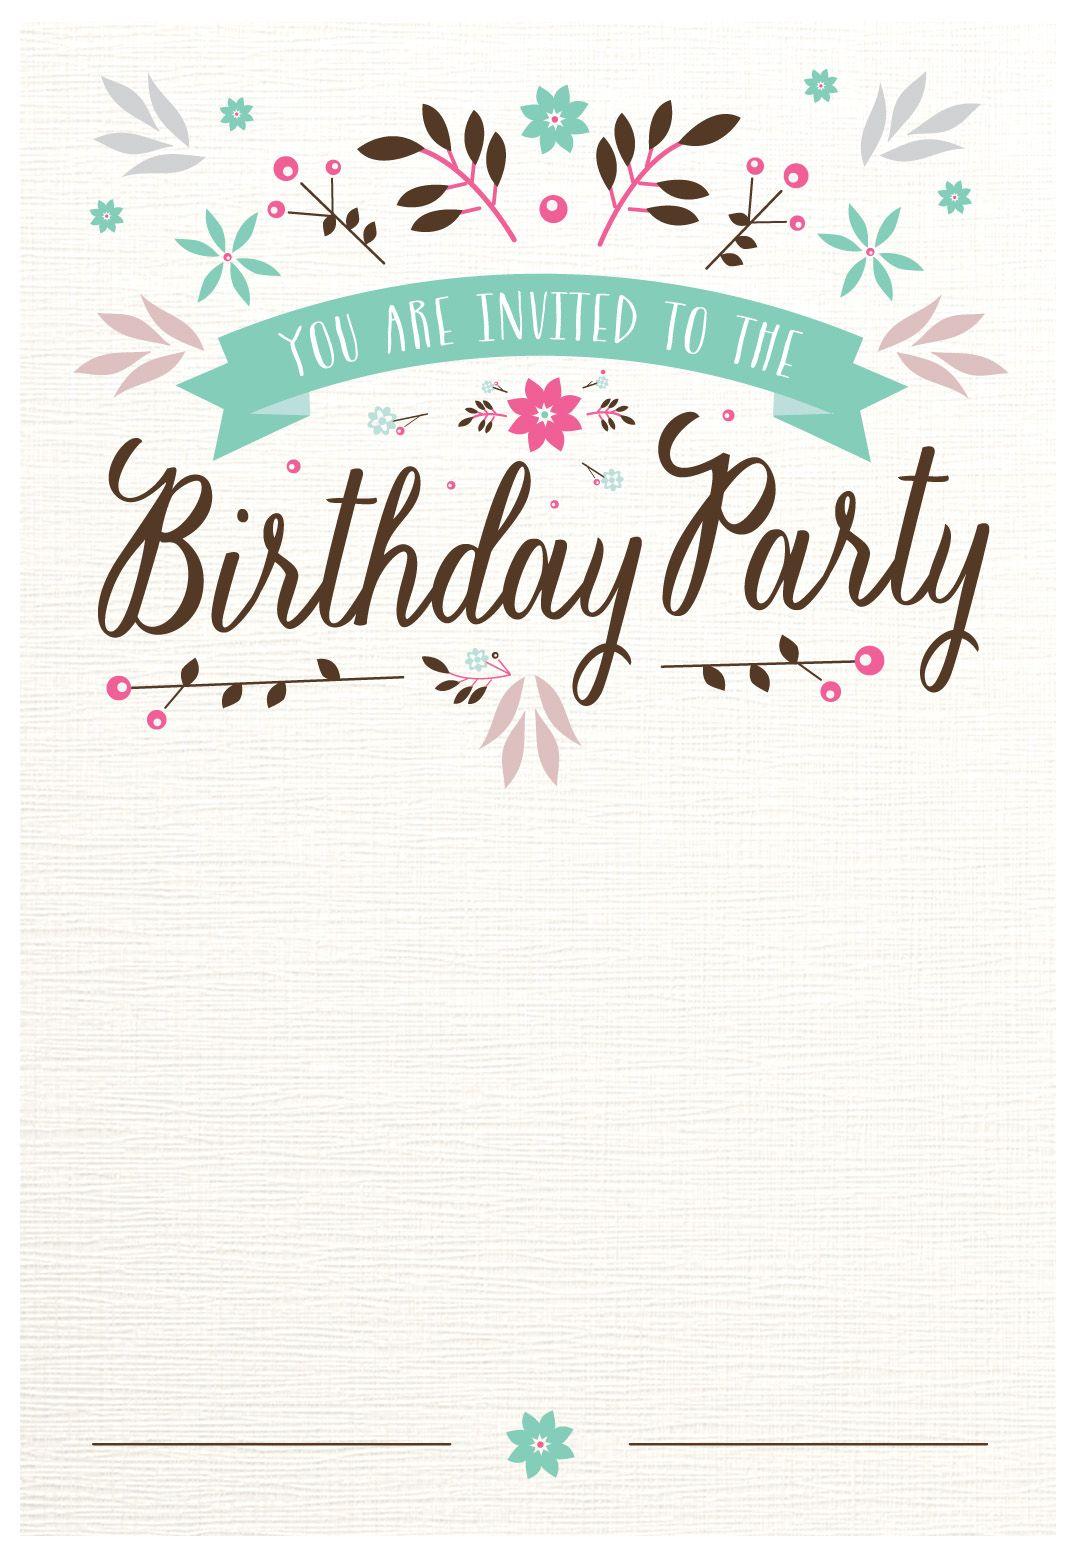 Flat Floral - Free Printable Birthday Invitation Template - Free Printable Invitations Templates